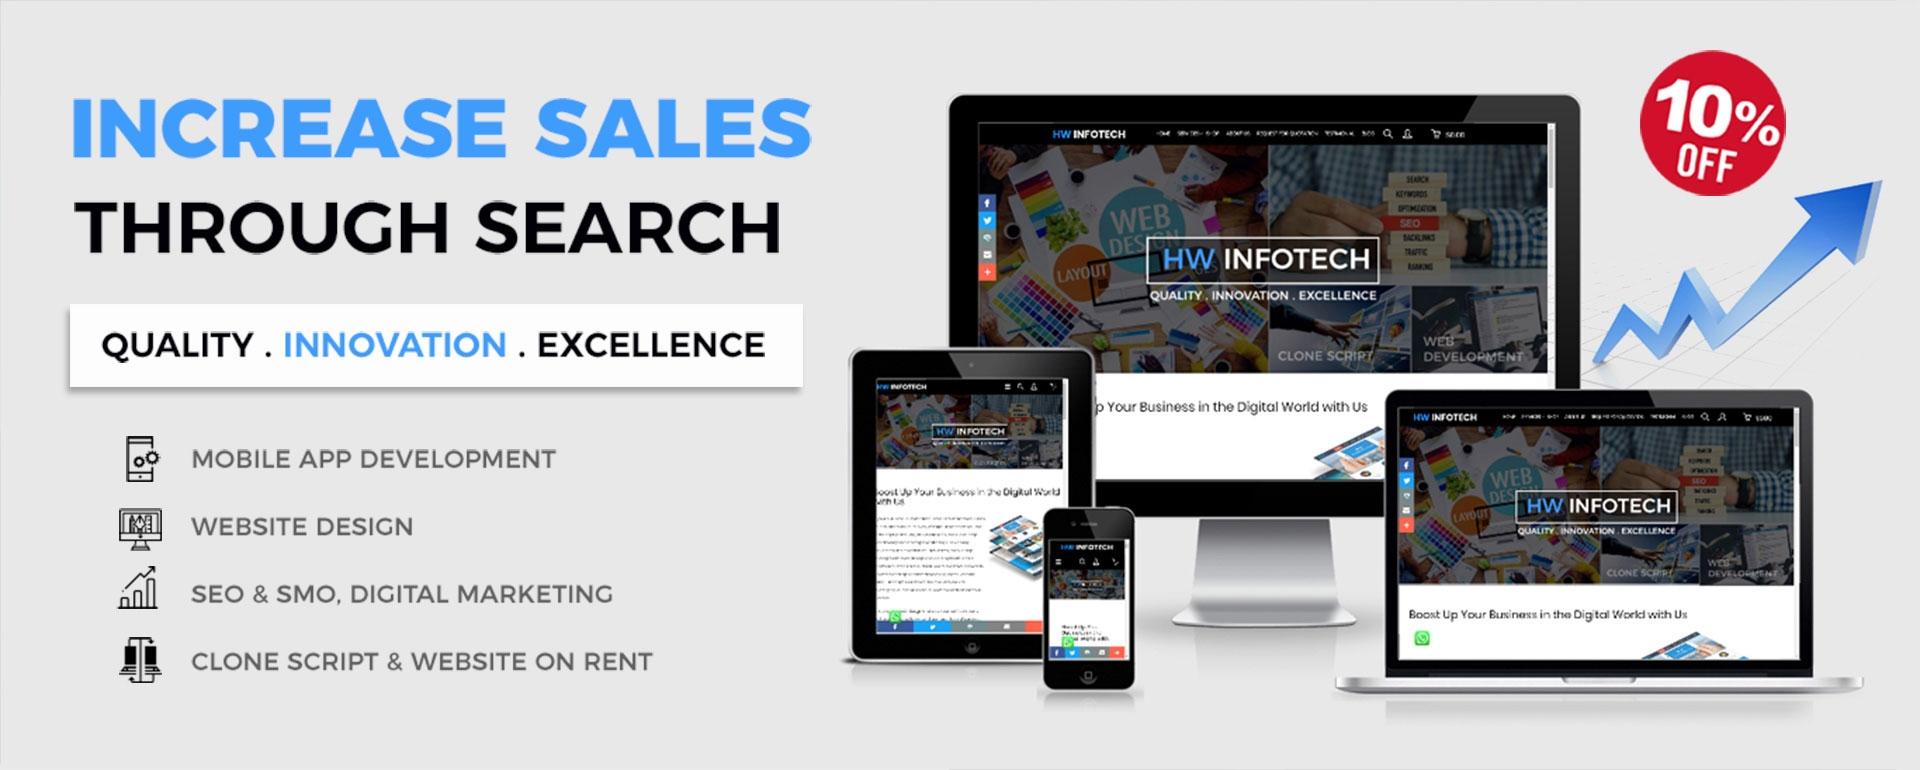 Development and Digital Marketing for App, Web, Software Clone Scripts